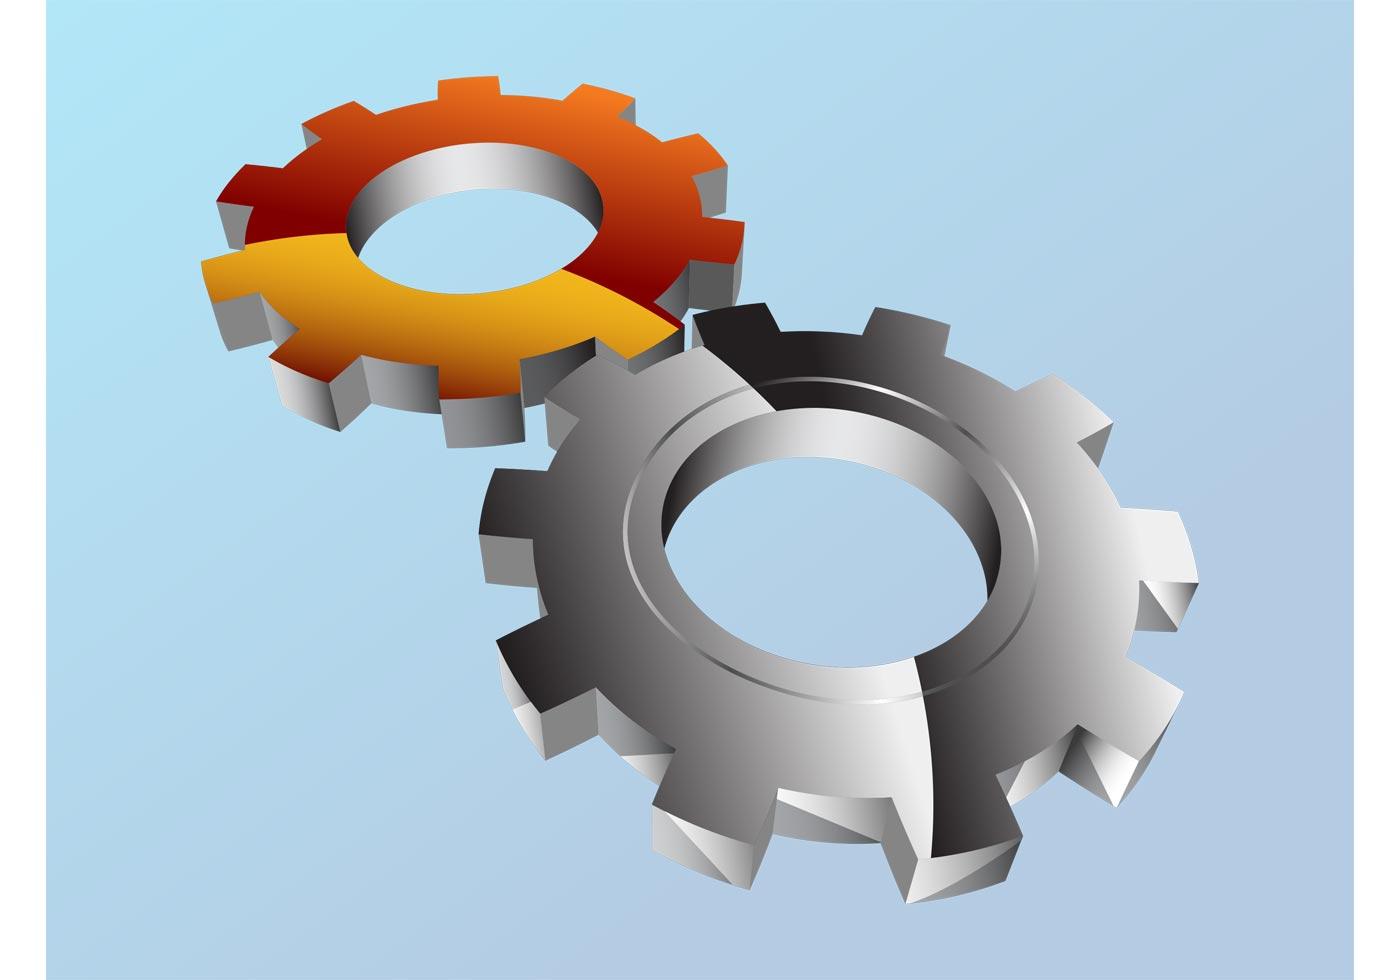 Shiny Gear Wheels - Download Free Vector Art, Stock ...